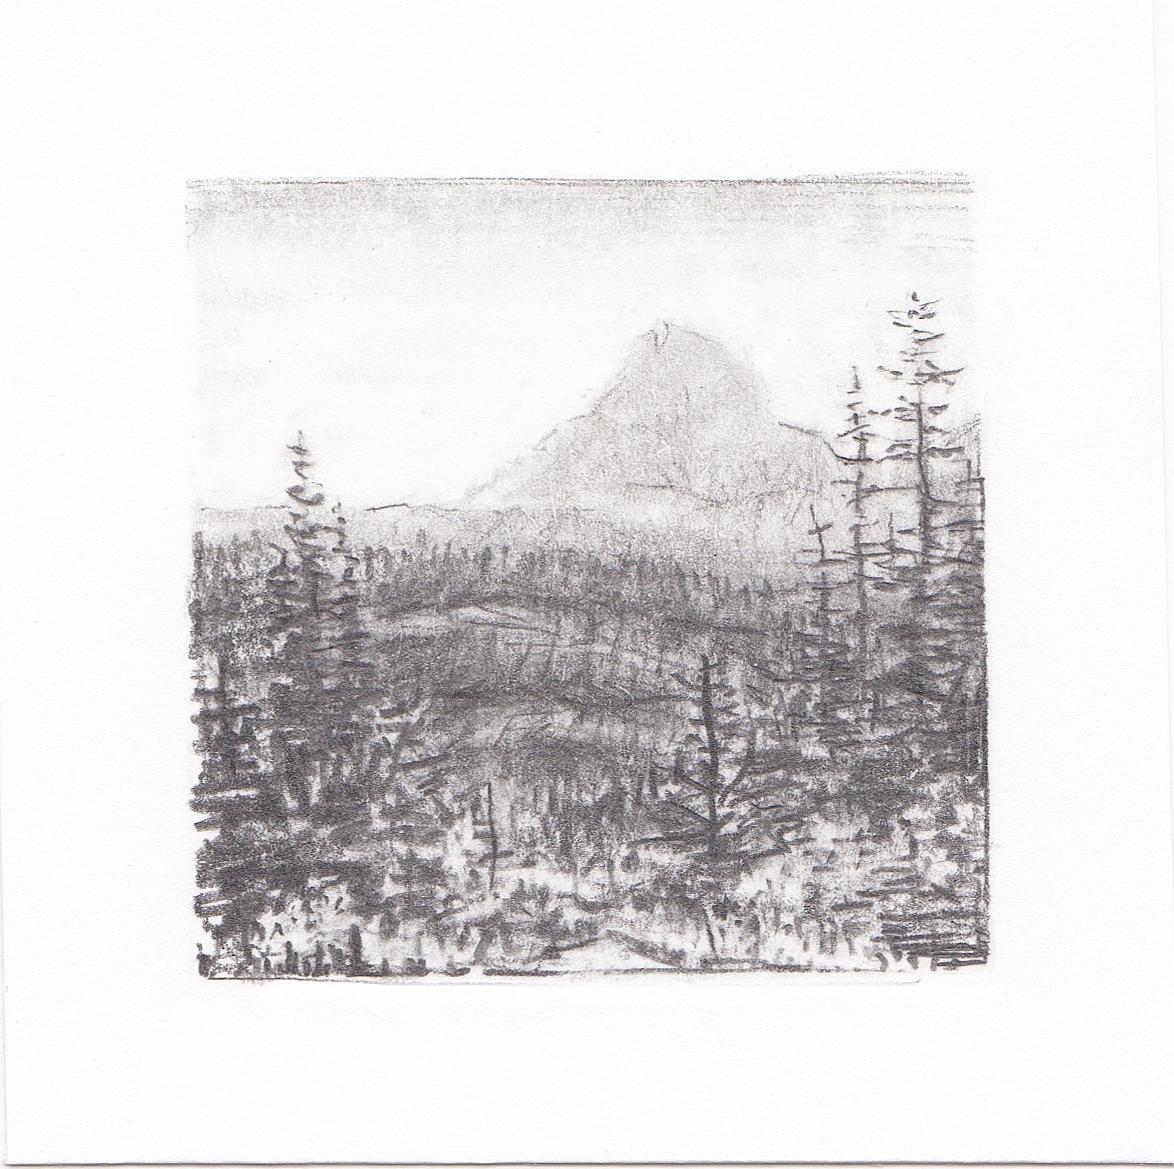 #47 Glacier National Park, Montana | 3x3 | graphite